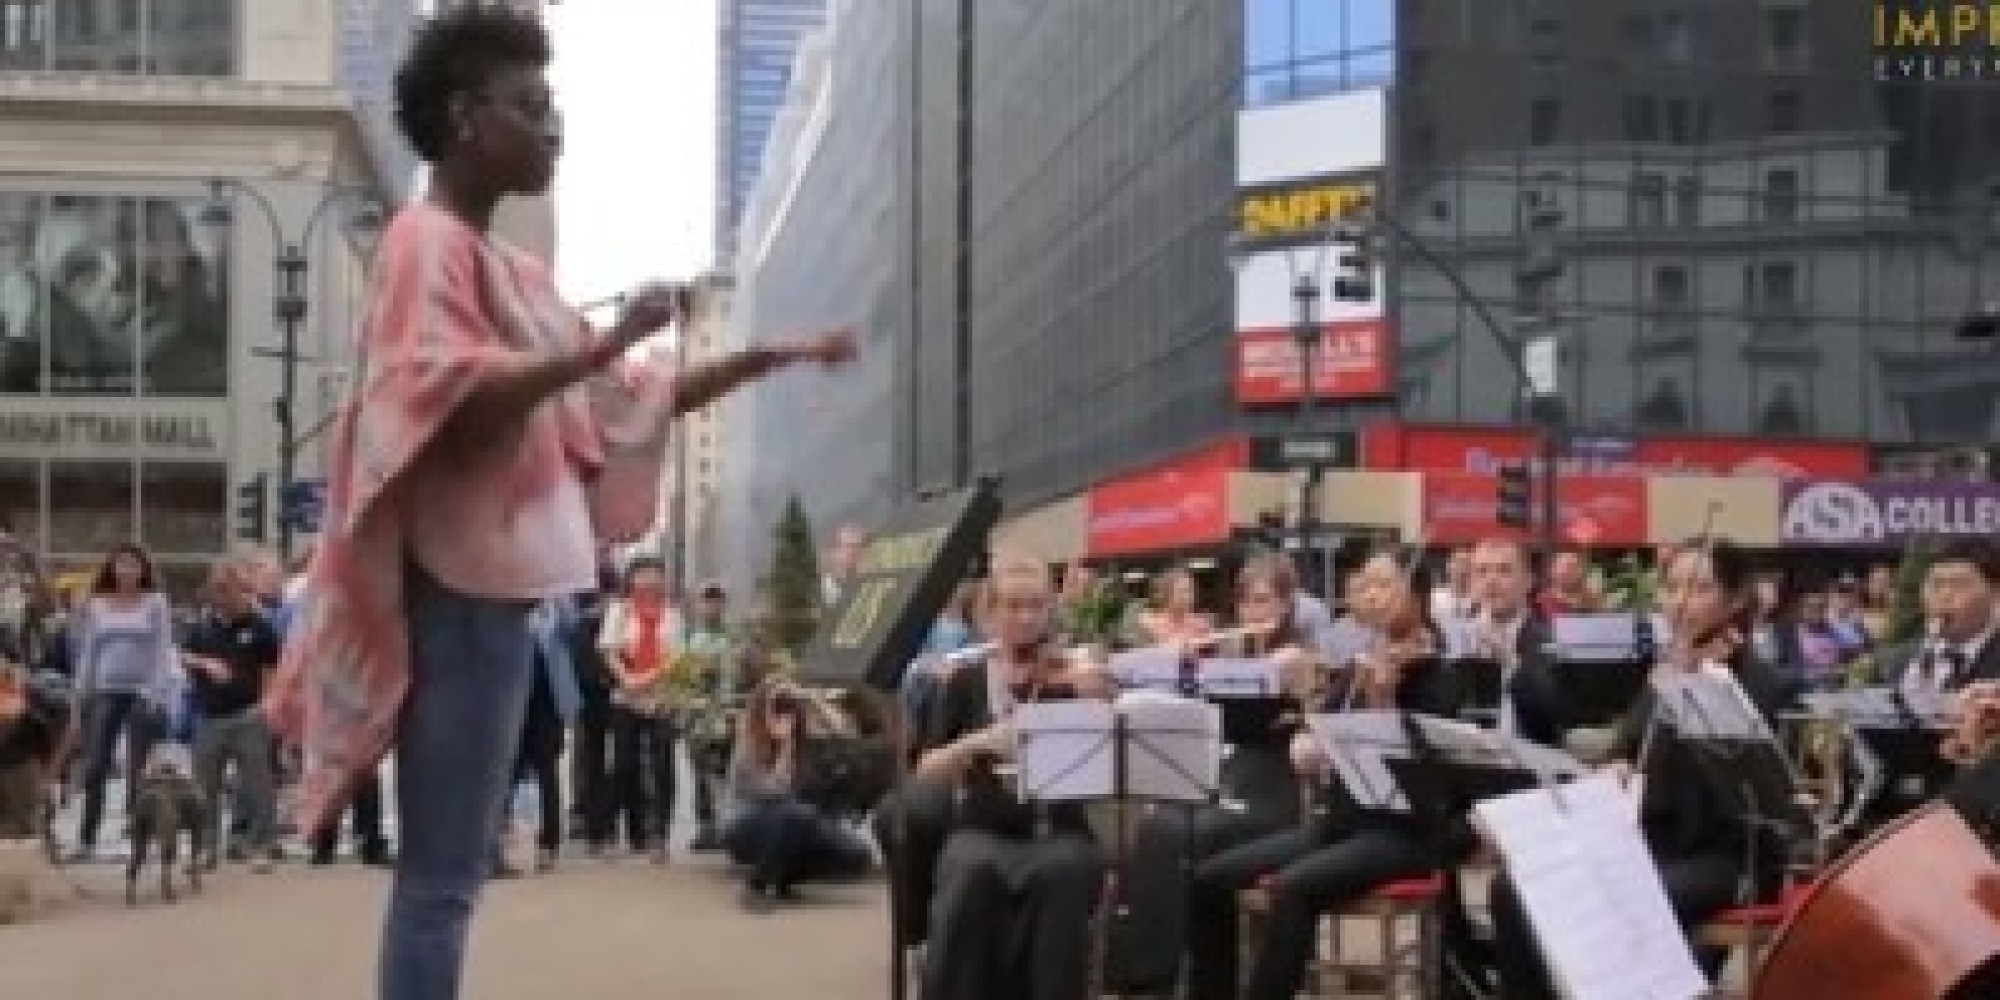 Vid o un orchestre dirig par des badauds new york for Un re a new york